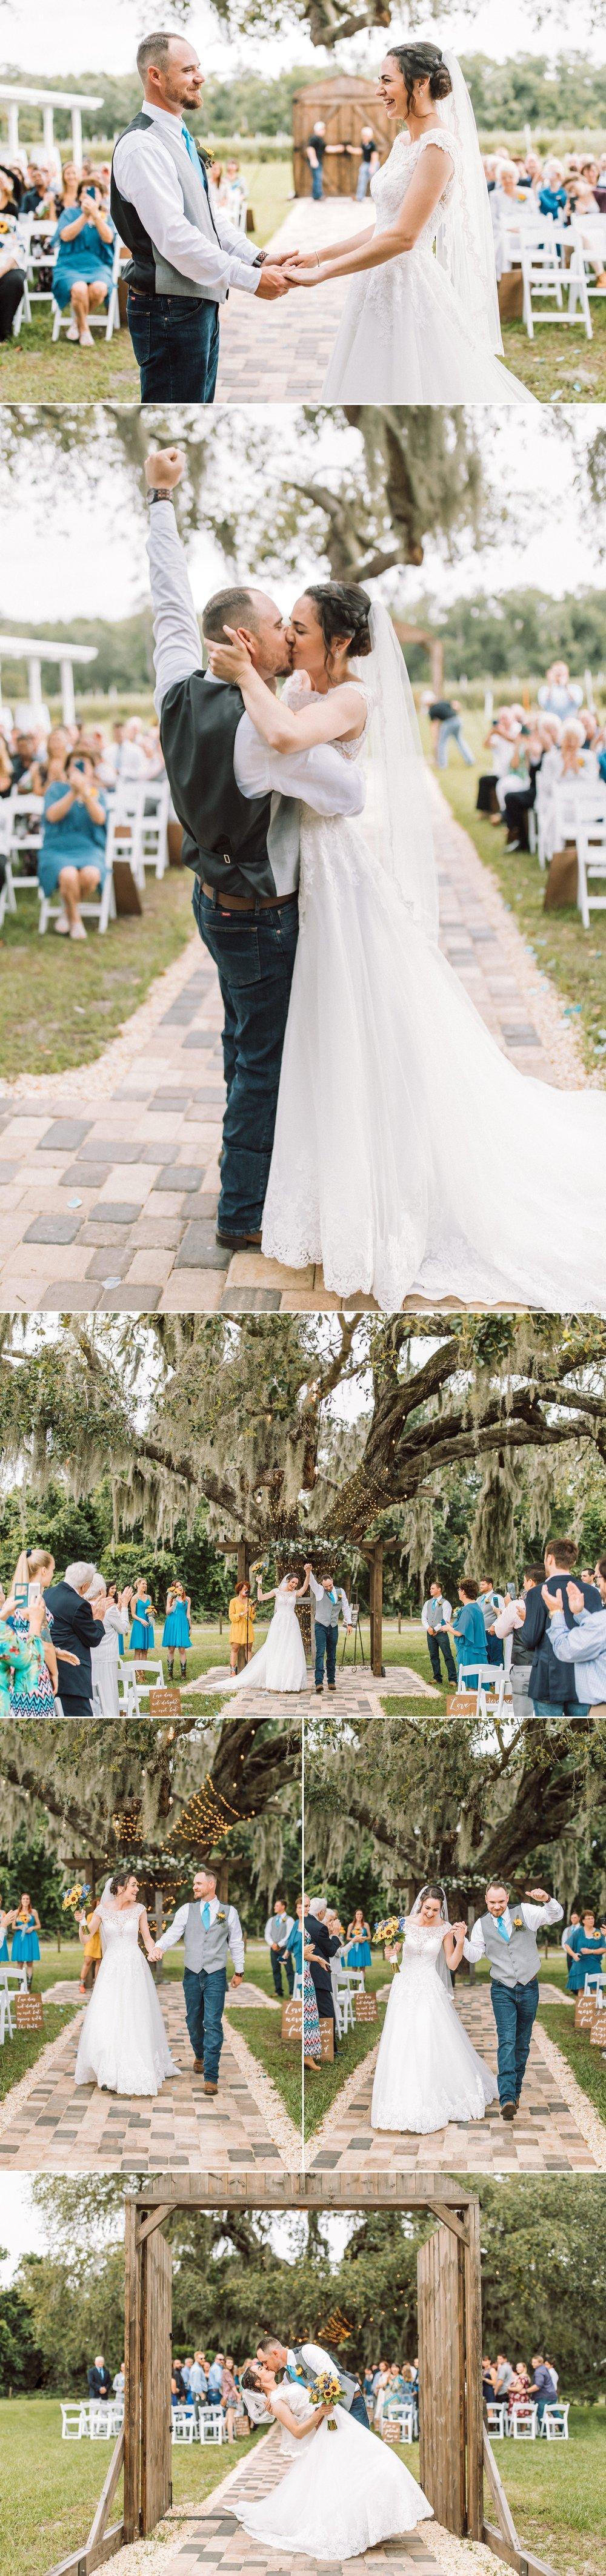 Rustic Sunflower & Blueberry Barn Wedding- Ever After Farms - Allie & NickBlog 20.jpg